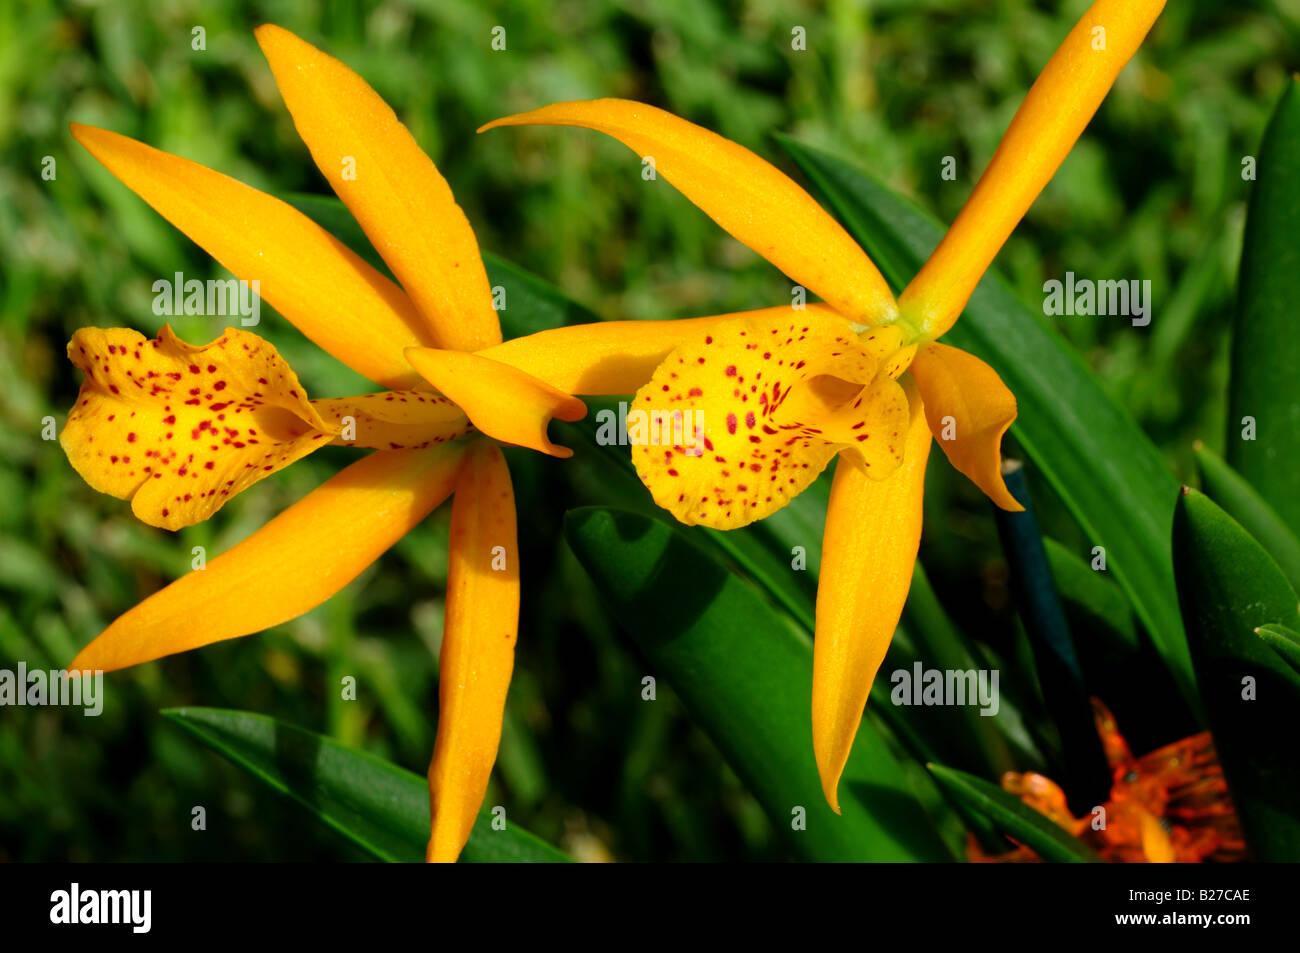 Two orange orchid flowers. Brassolaeliocattleya Blc. Haleahi Sunbow x Blc. Richard Mueller. - Stock Image